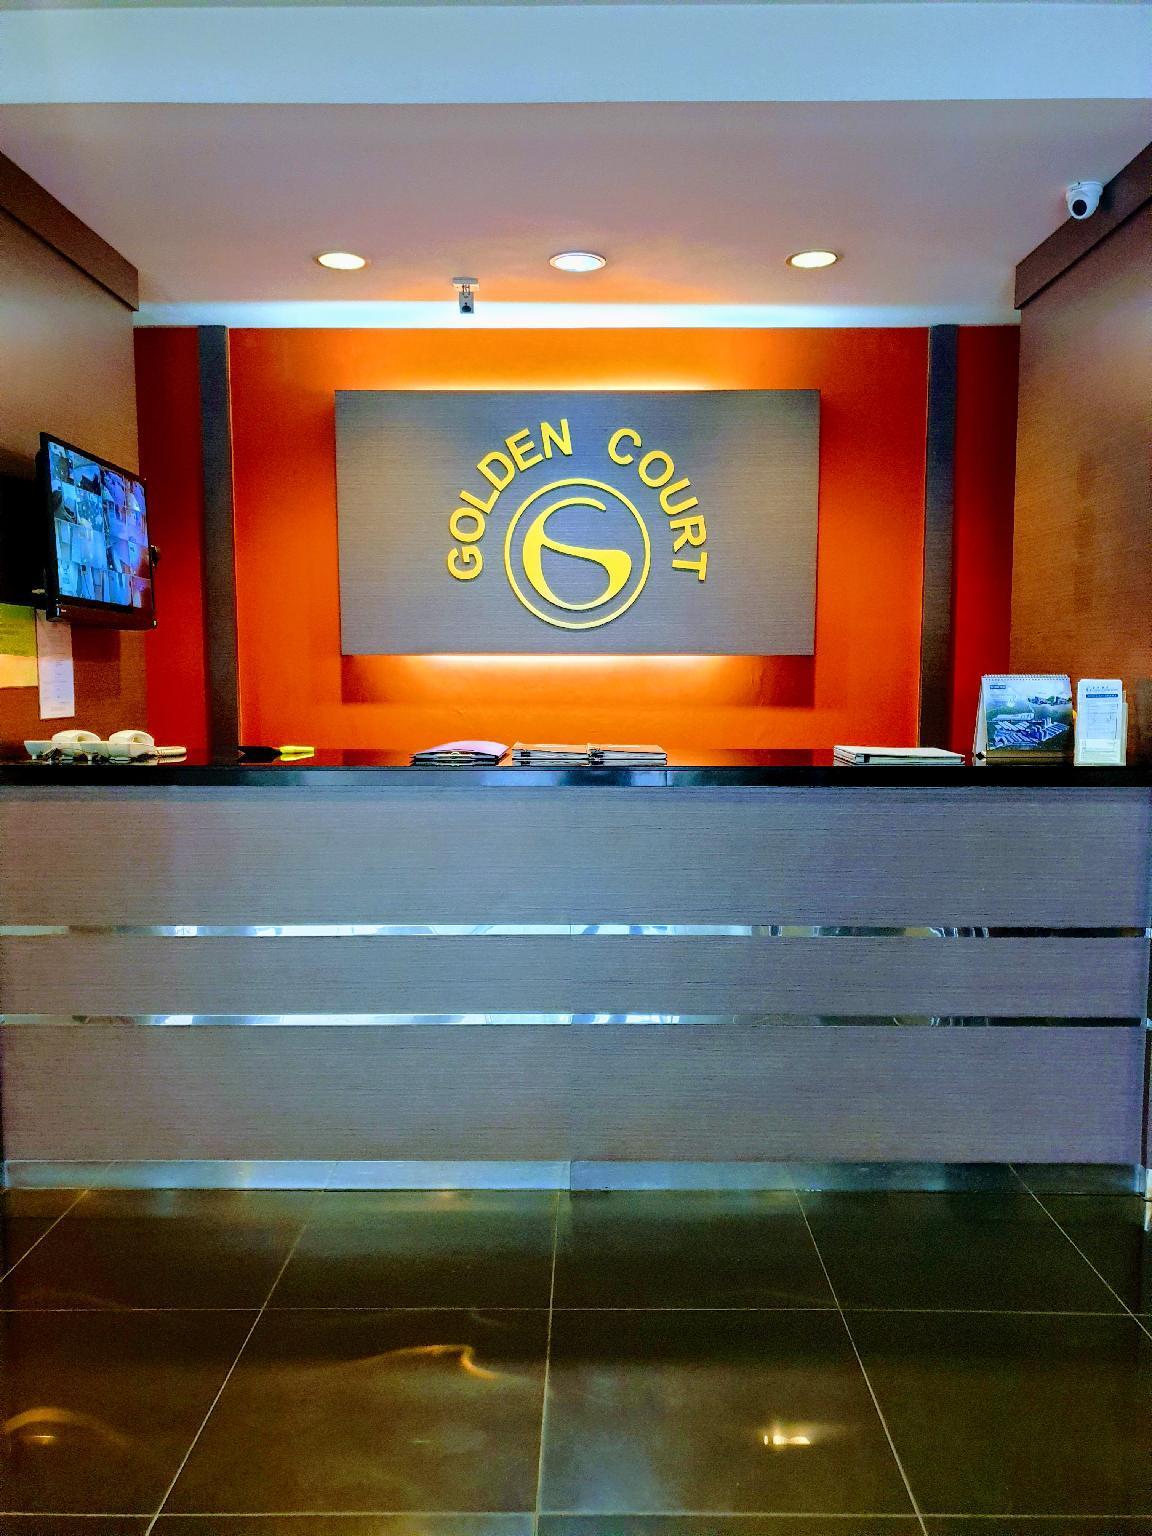 Golden Court Hotel @ Taman Pelangi